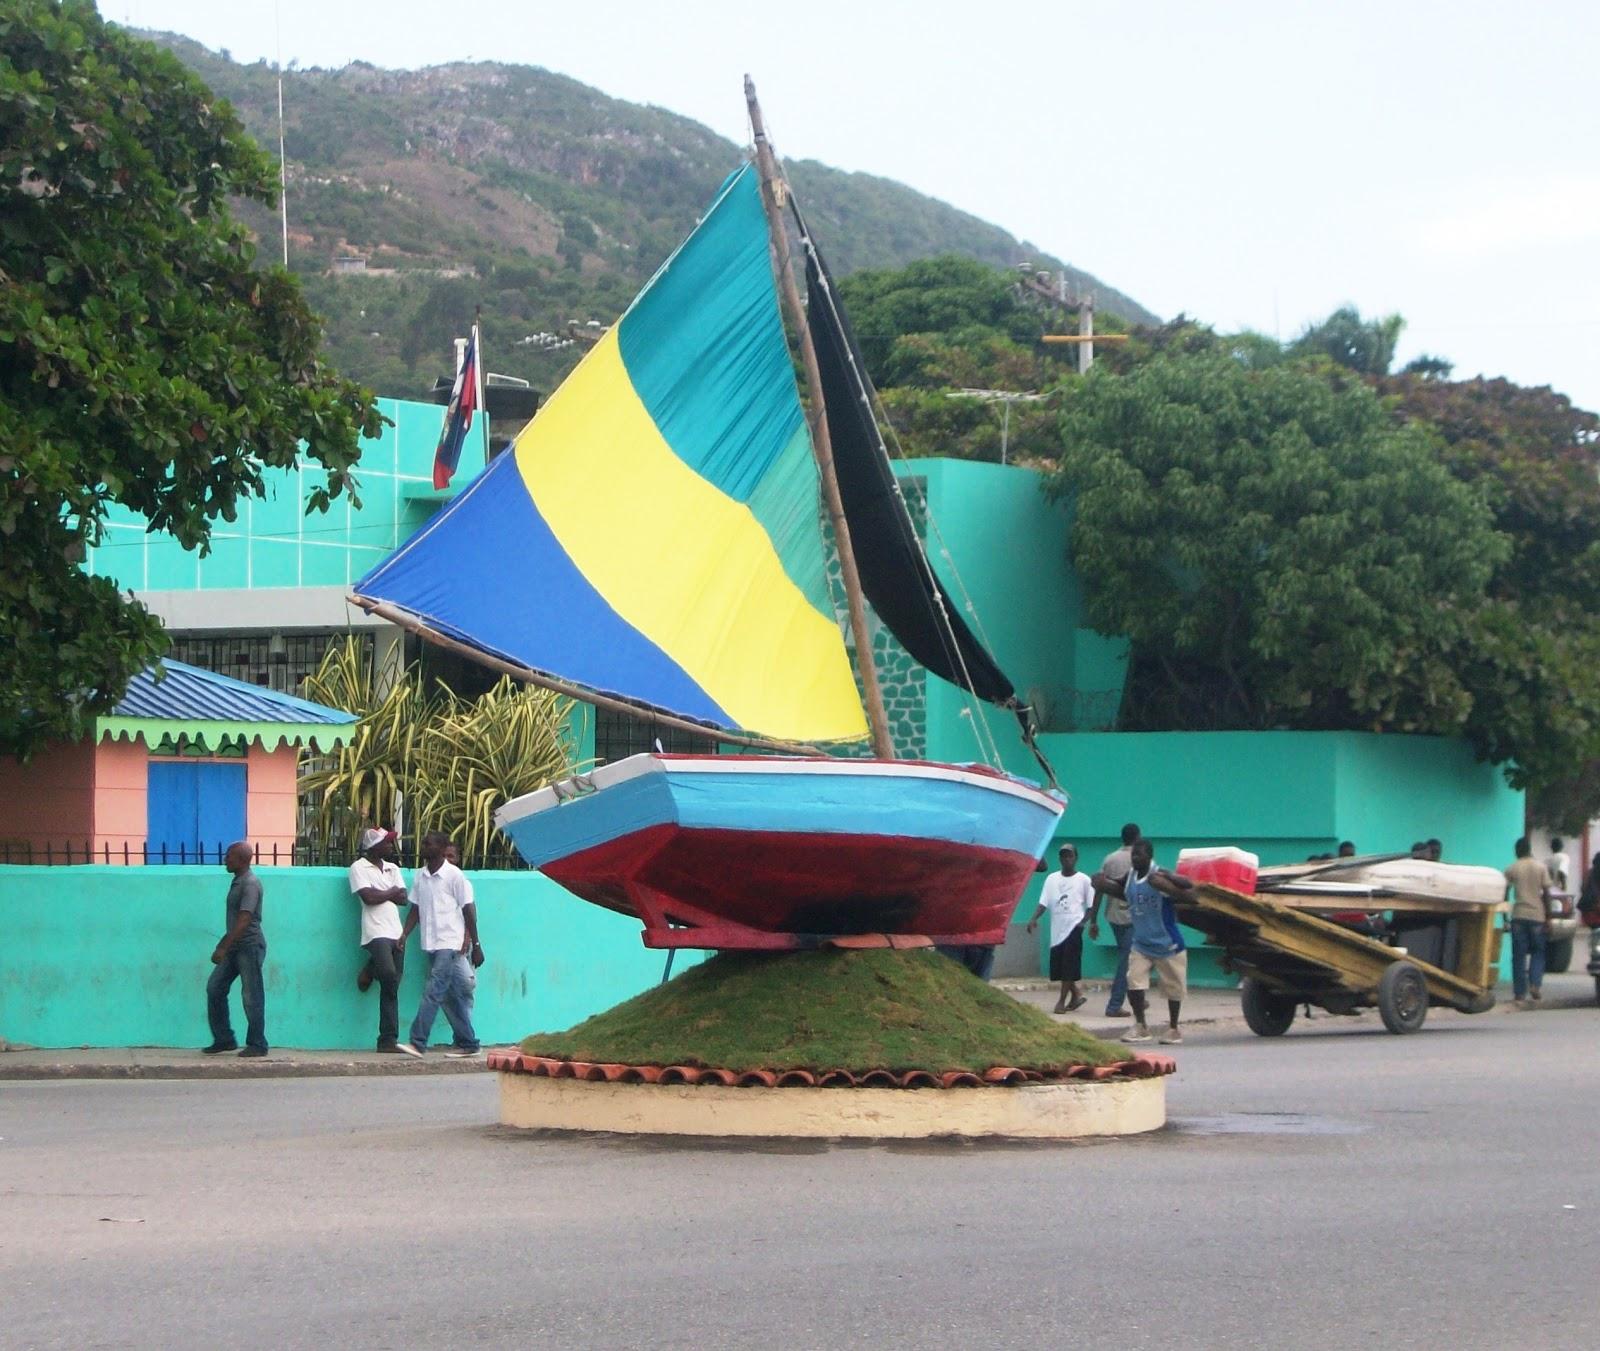 Festival de la mer au Cap-Haitien  :13 au 15 juille saki rete anko  nan vil Okap 100_3356